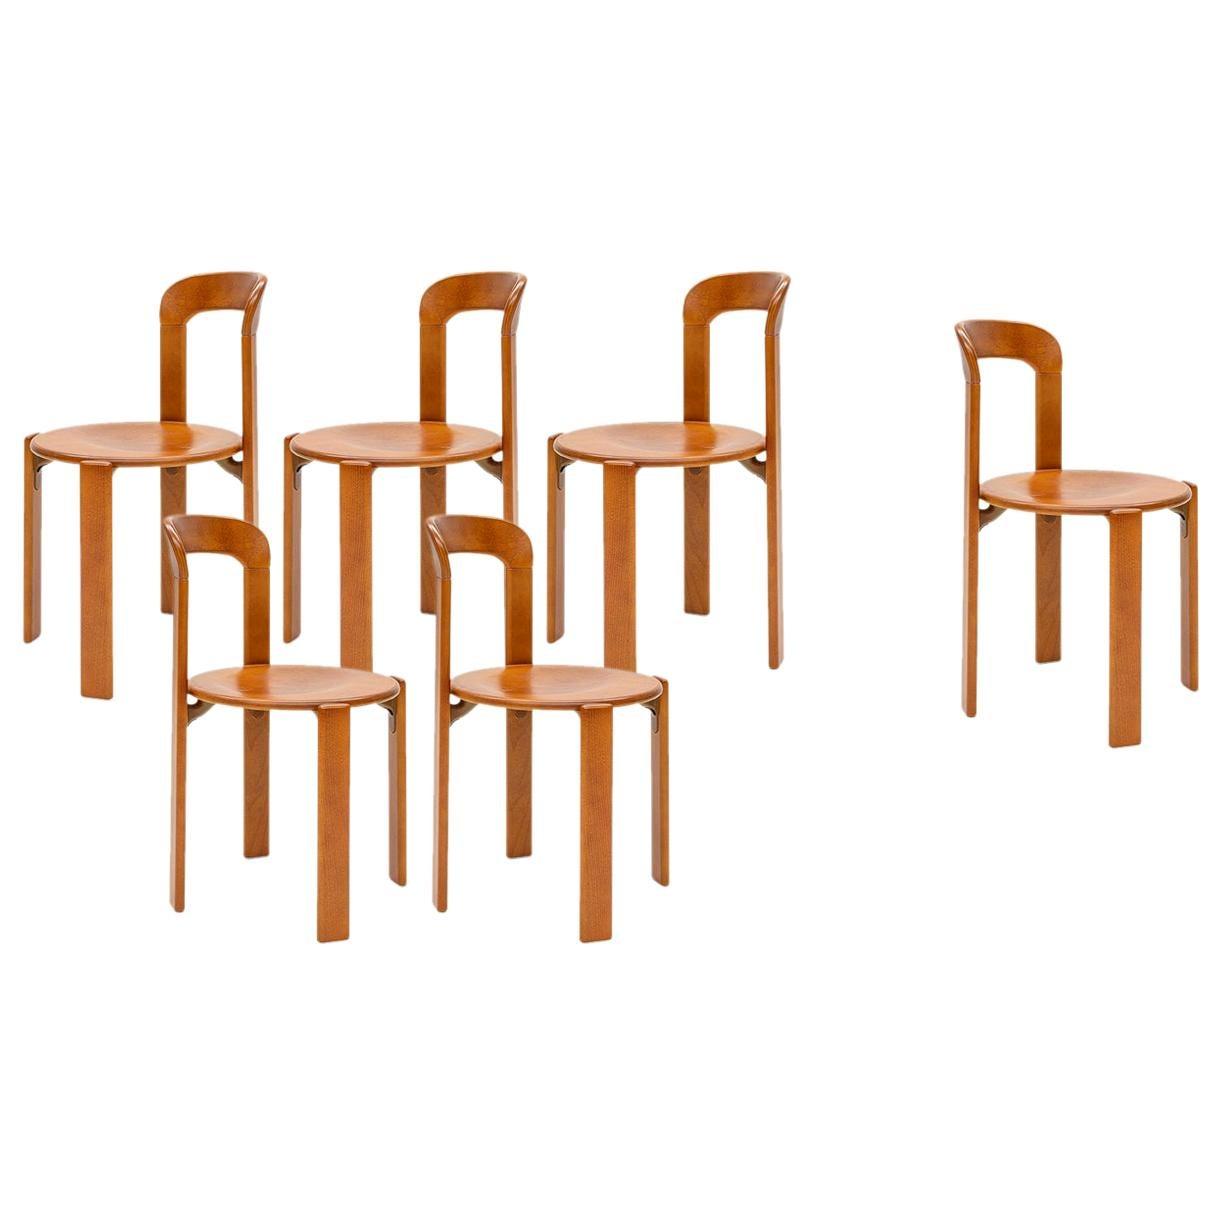 Mid-Century Modern, 6 Rey Chairs by Bruno Rey, Color Vintage Cherry, Design 1971